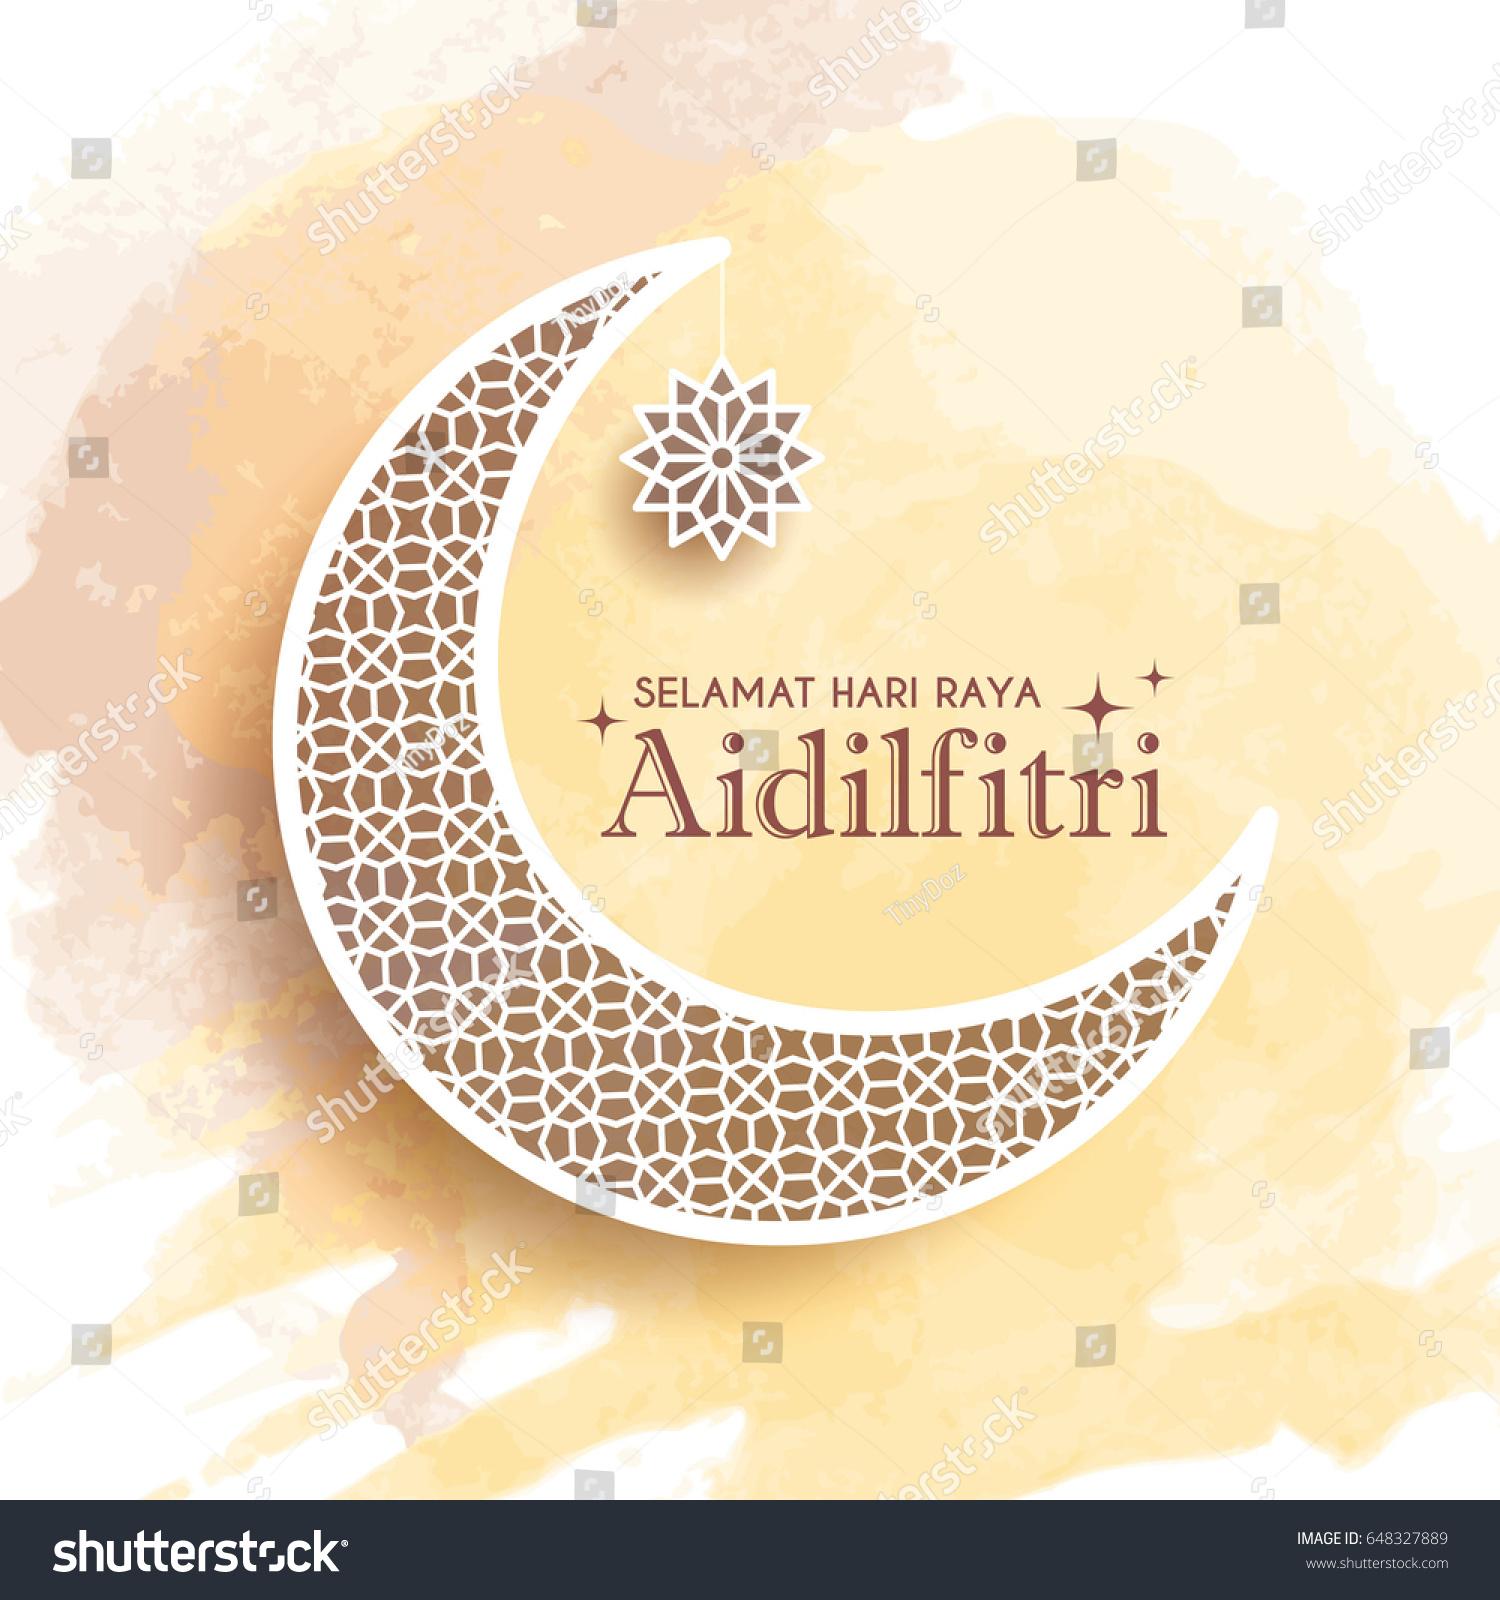 hari raya aidilfitri greeting card template のベクター画像素材